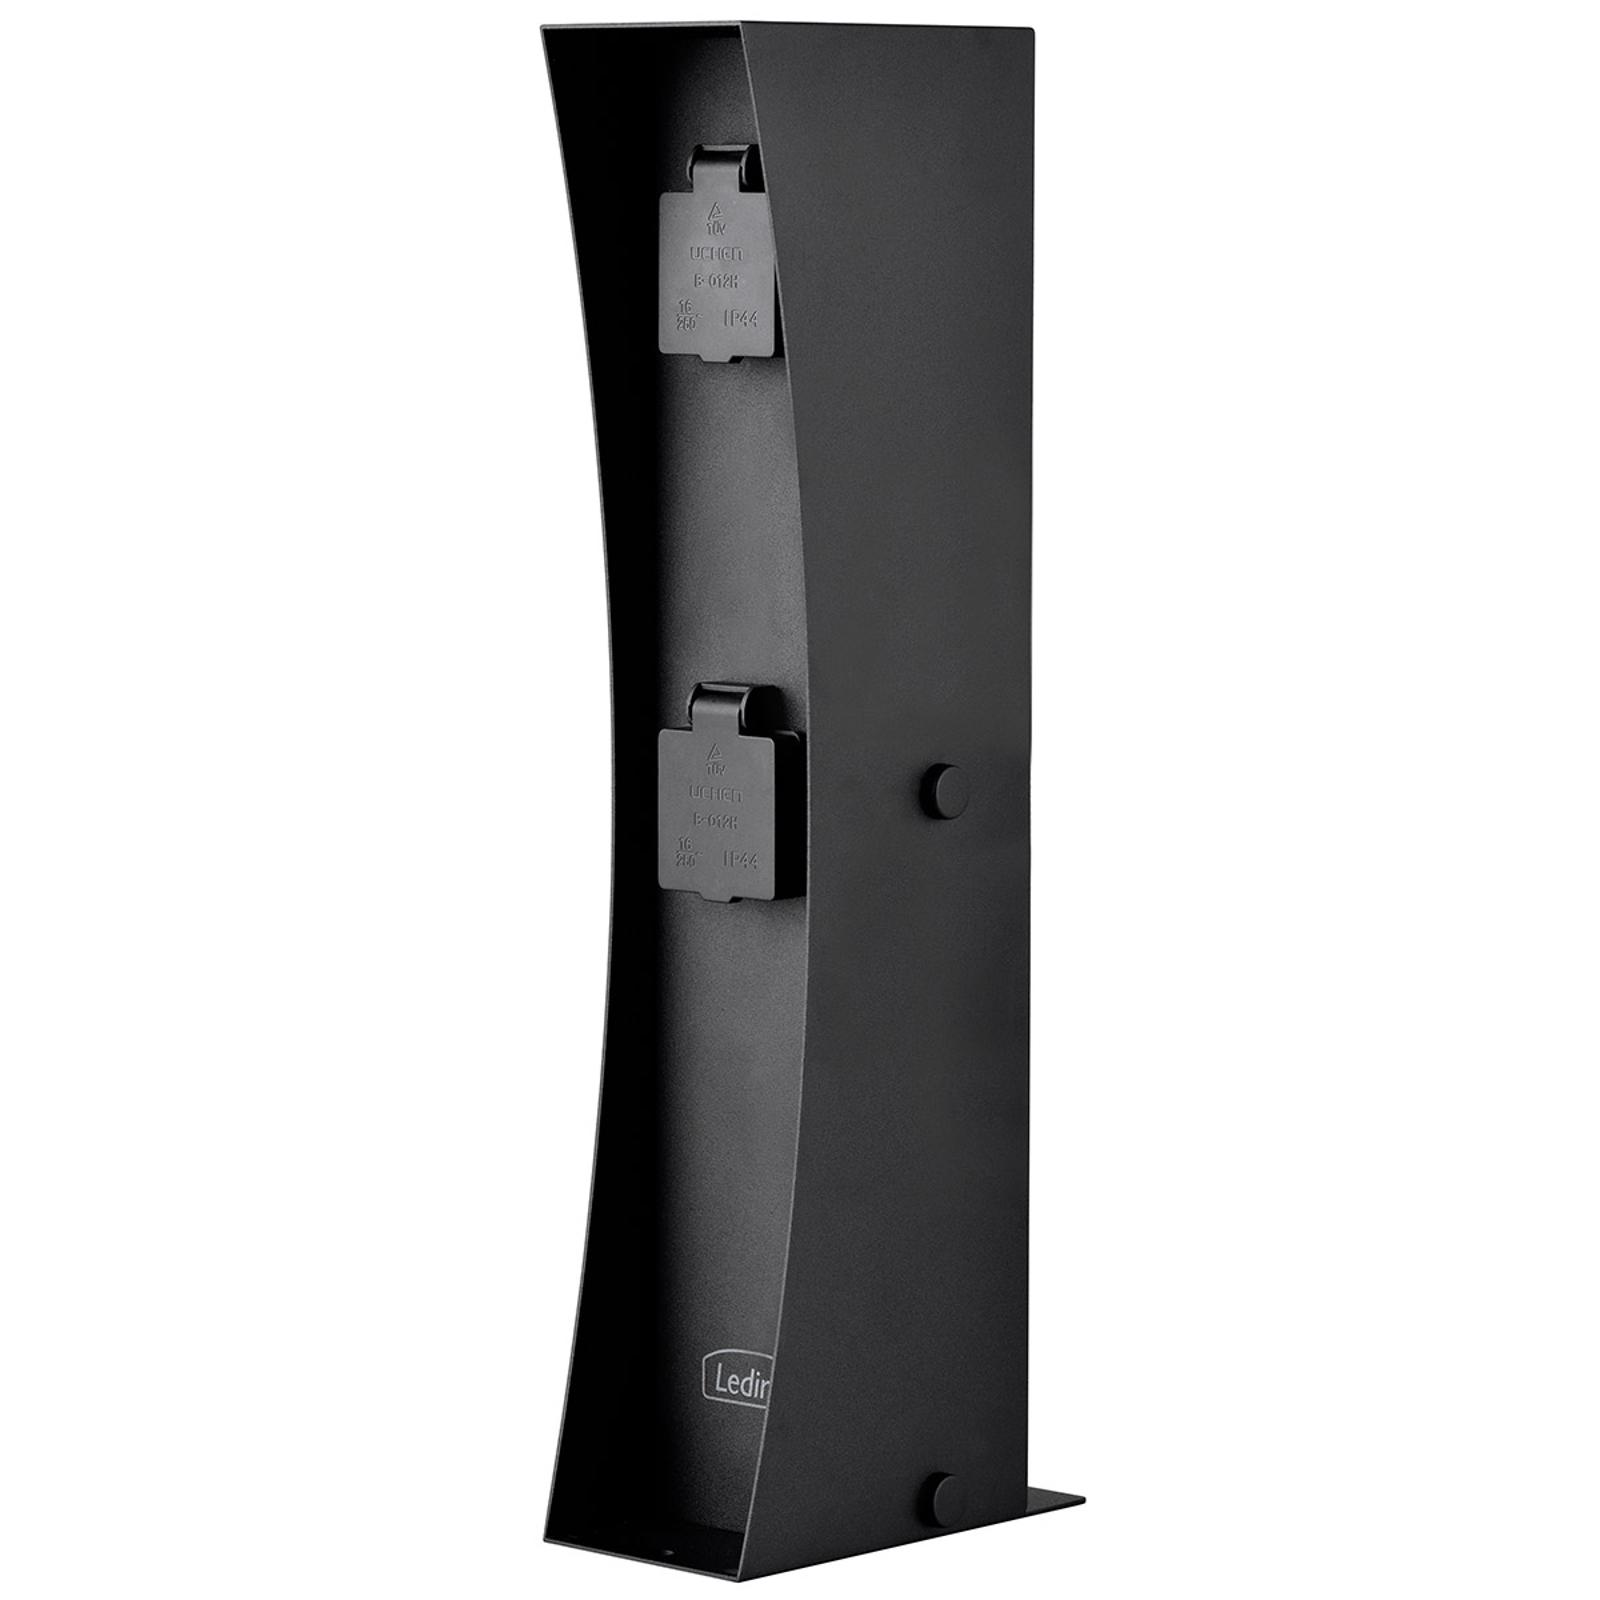 Steckdosensäule Connect D2, schwarz